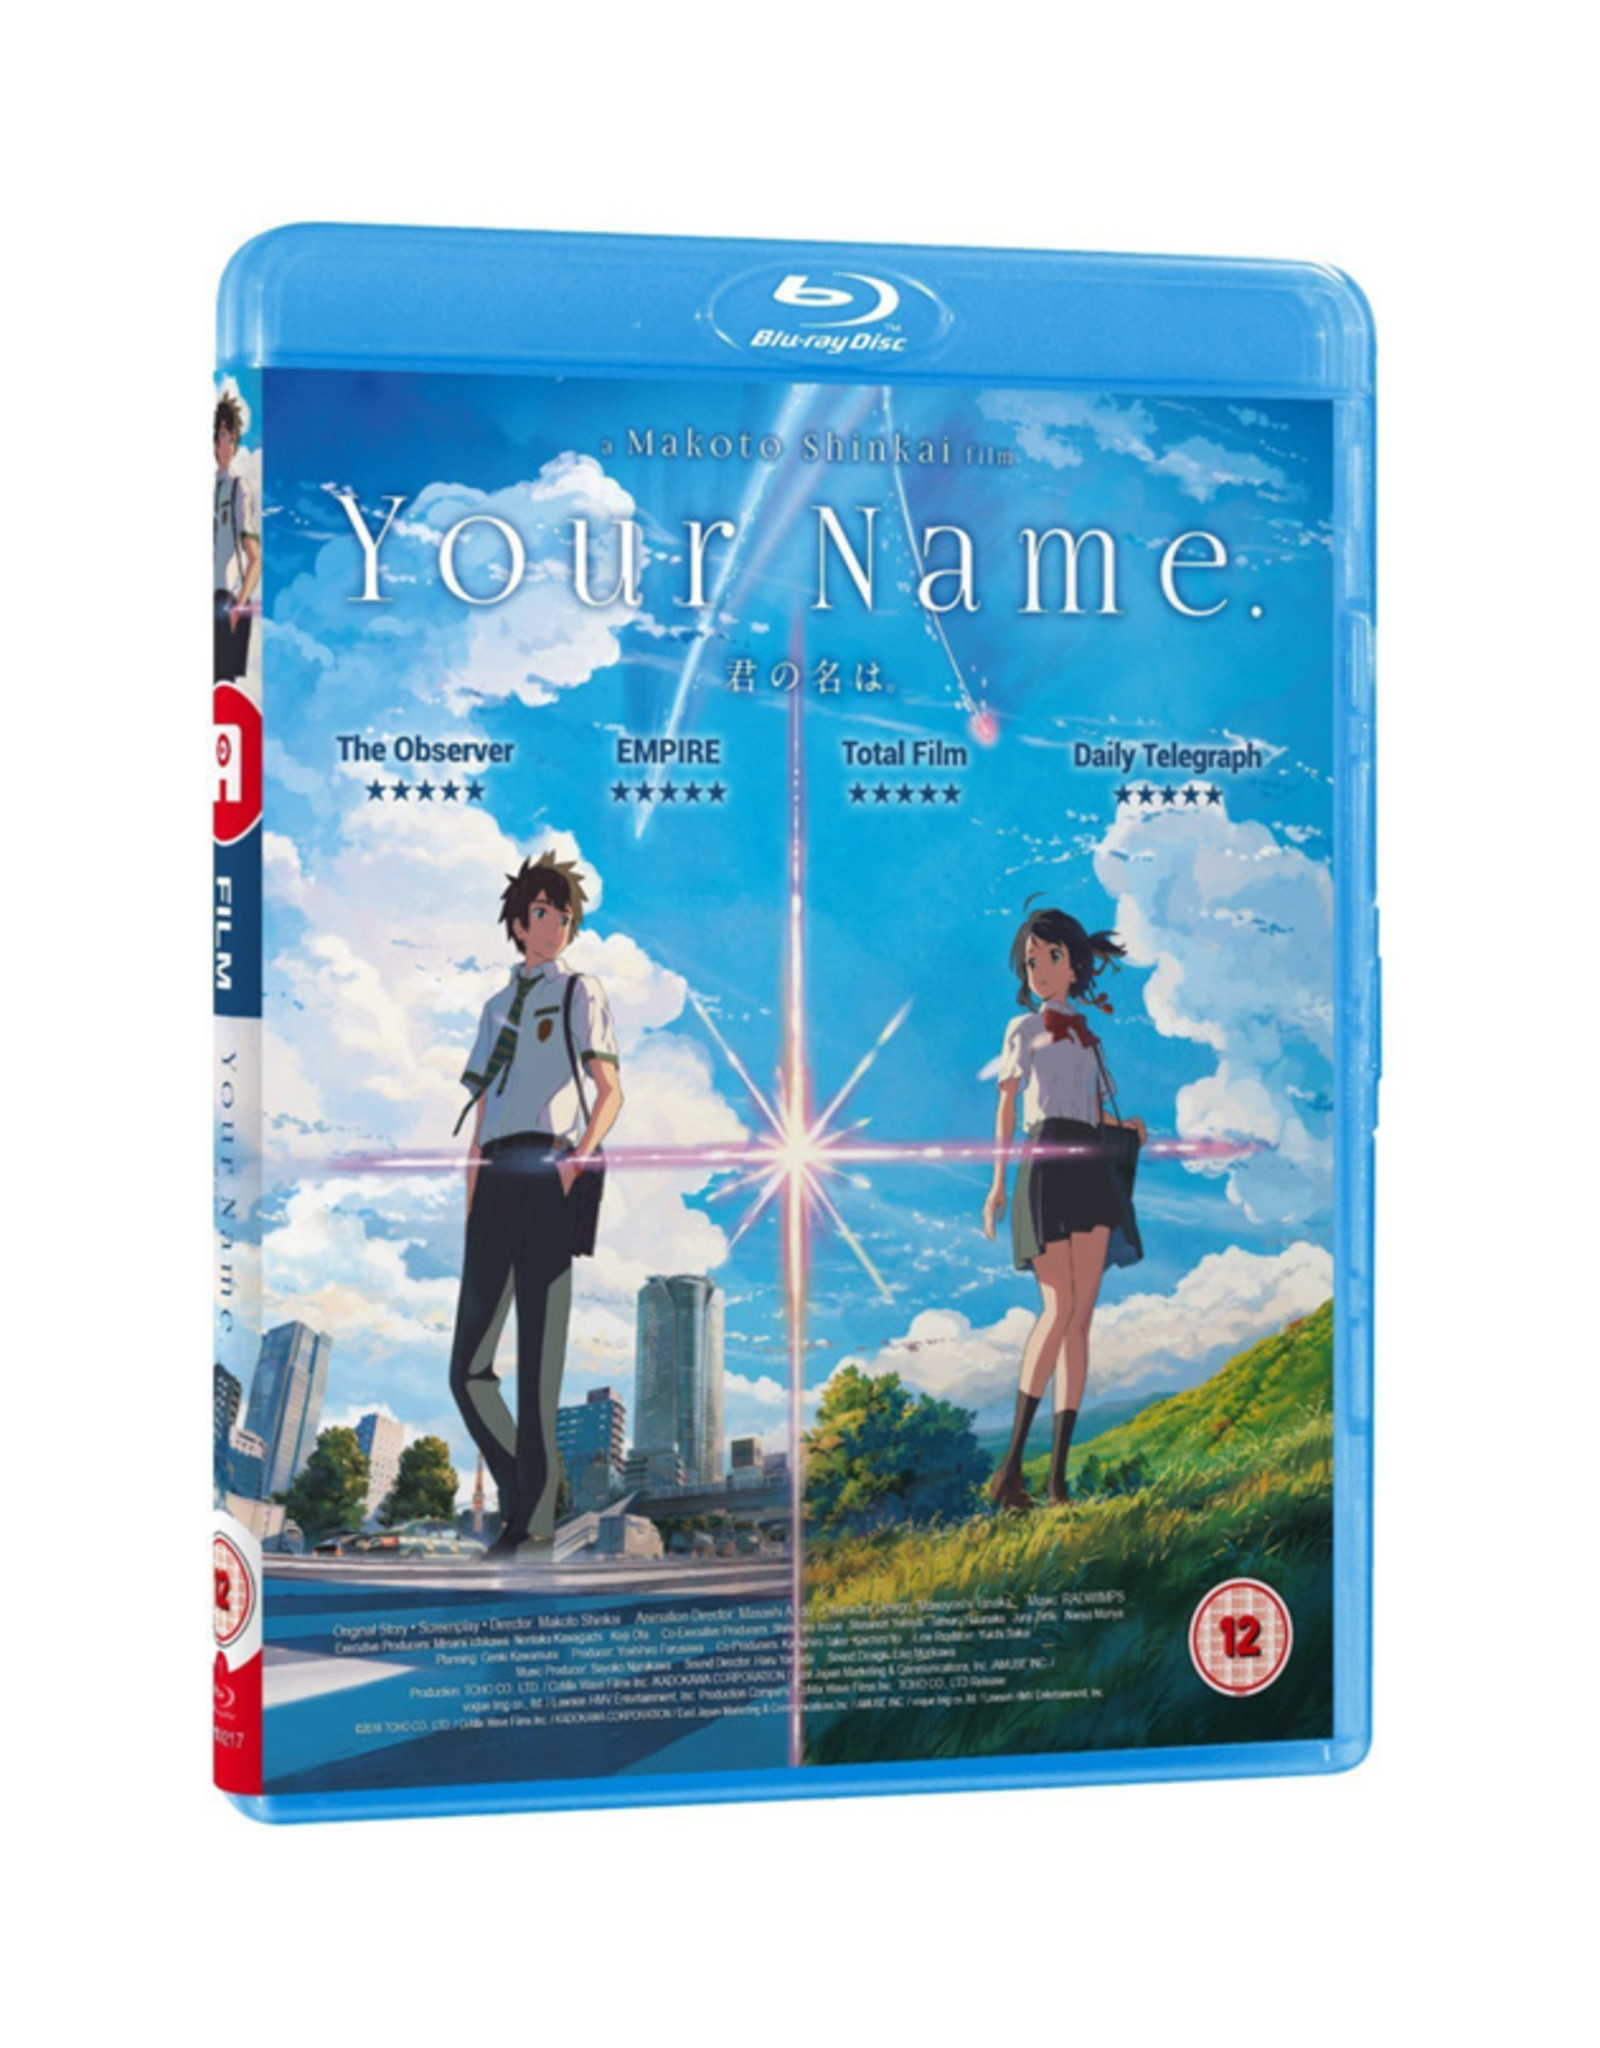 Your Name (Blu-ray) - Original version, English subtitles